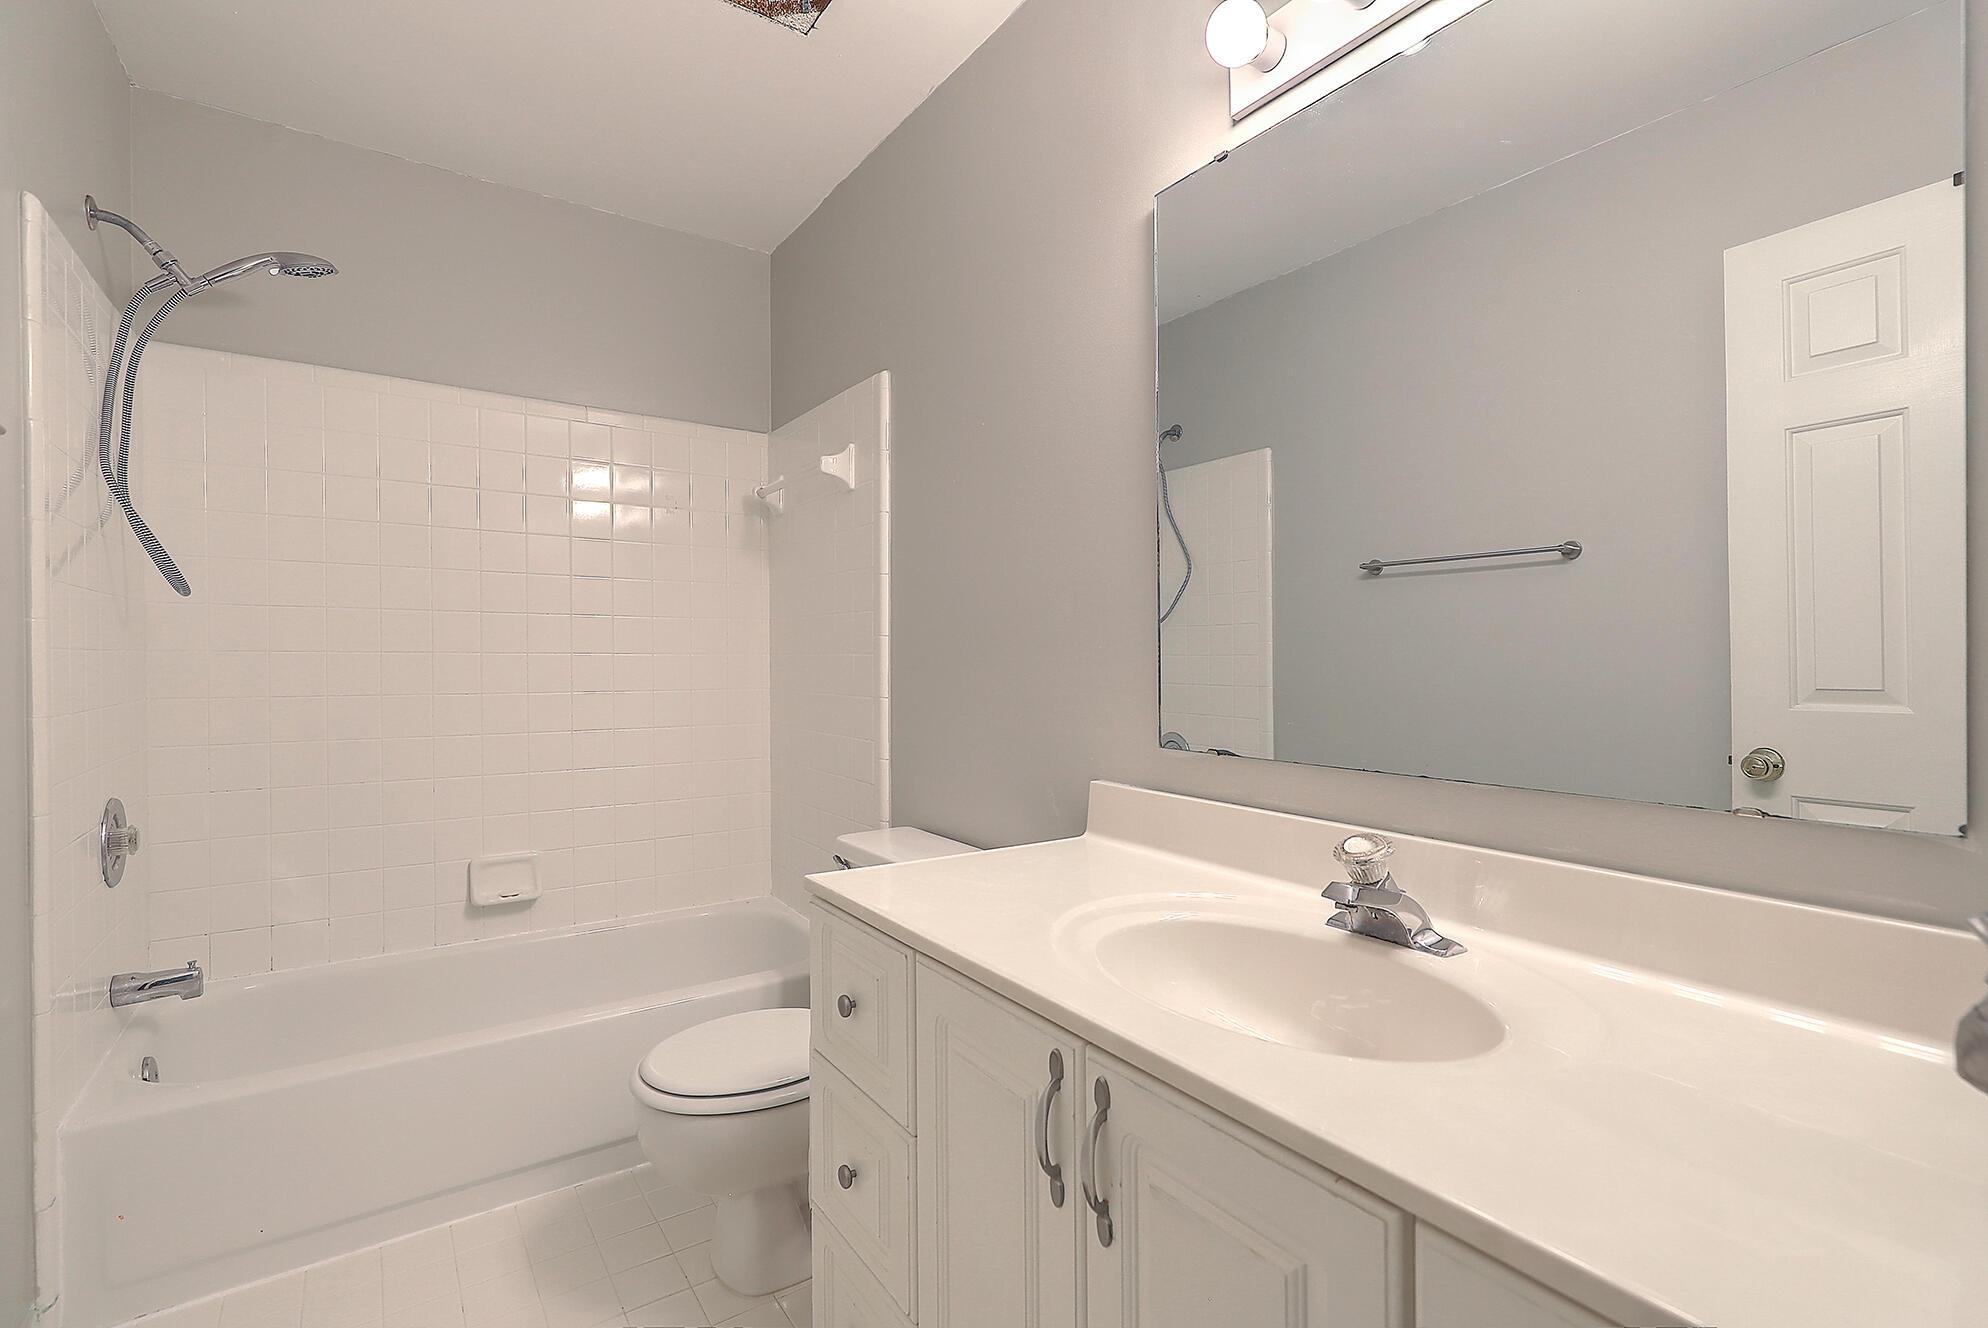 Appian Landing Homes For Sale - 8262 Longridge, North Charleston, SC - 2